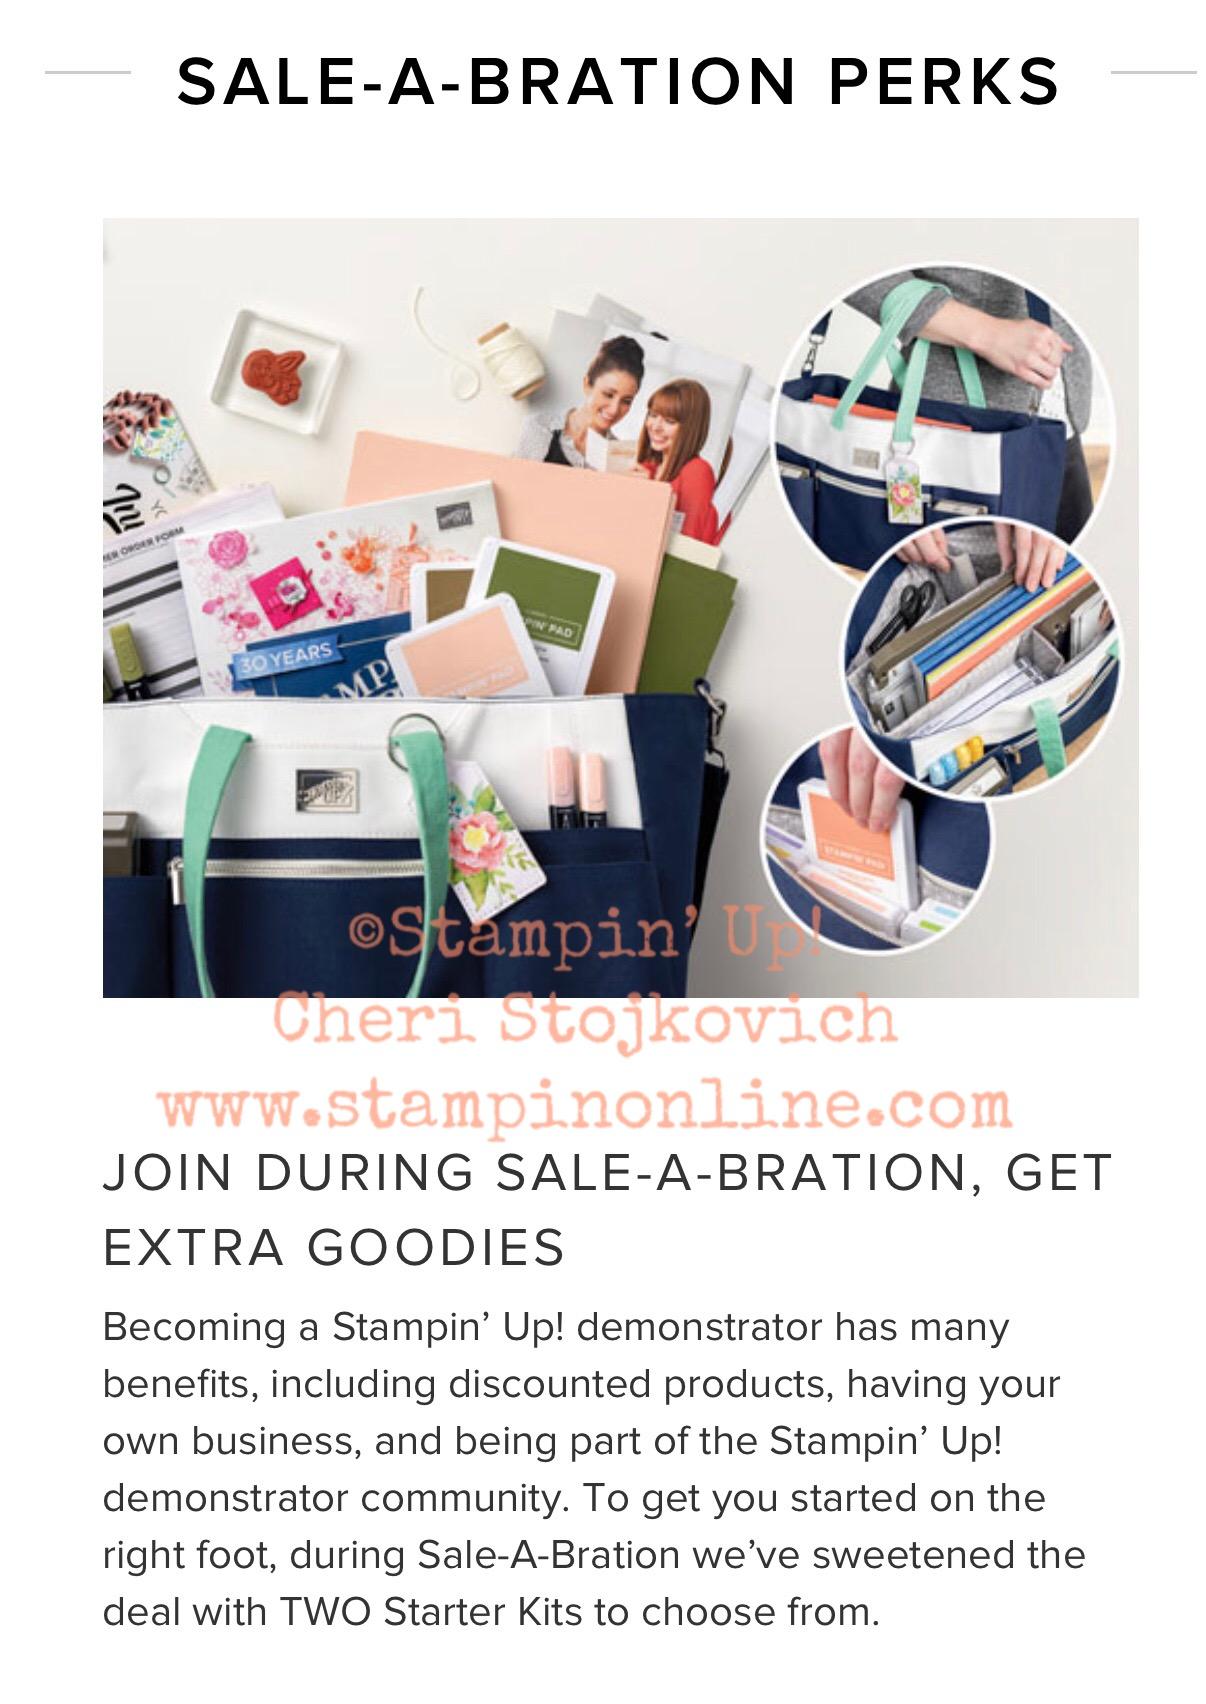 Sale-A-Bration 2019 Last Blast Week! Don't Miss Out!